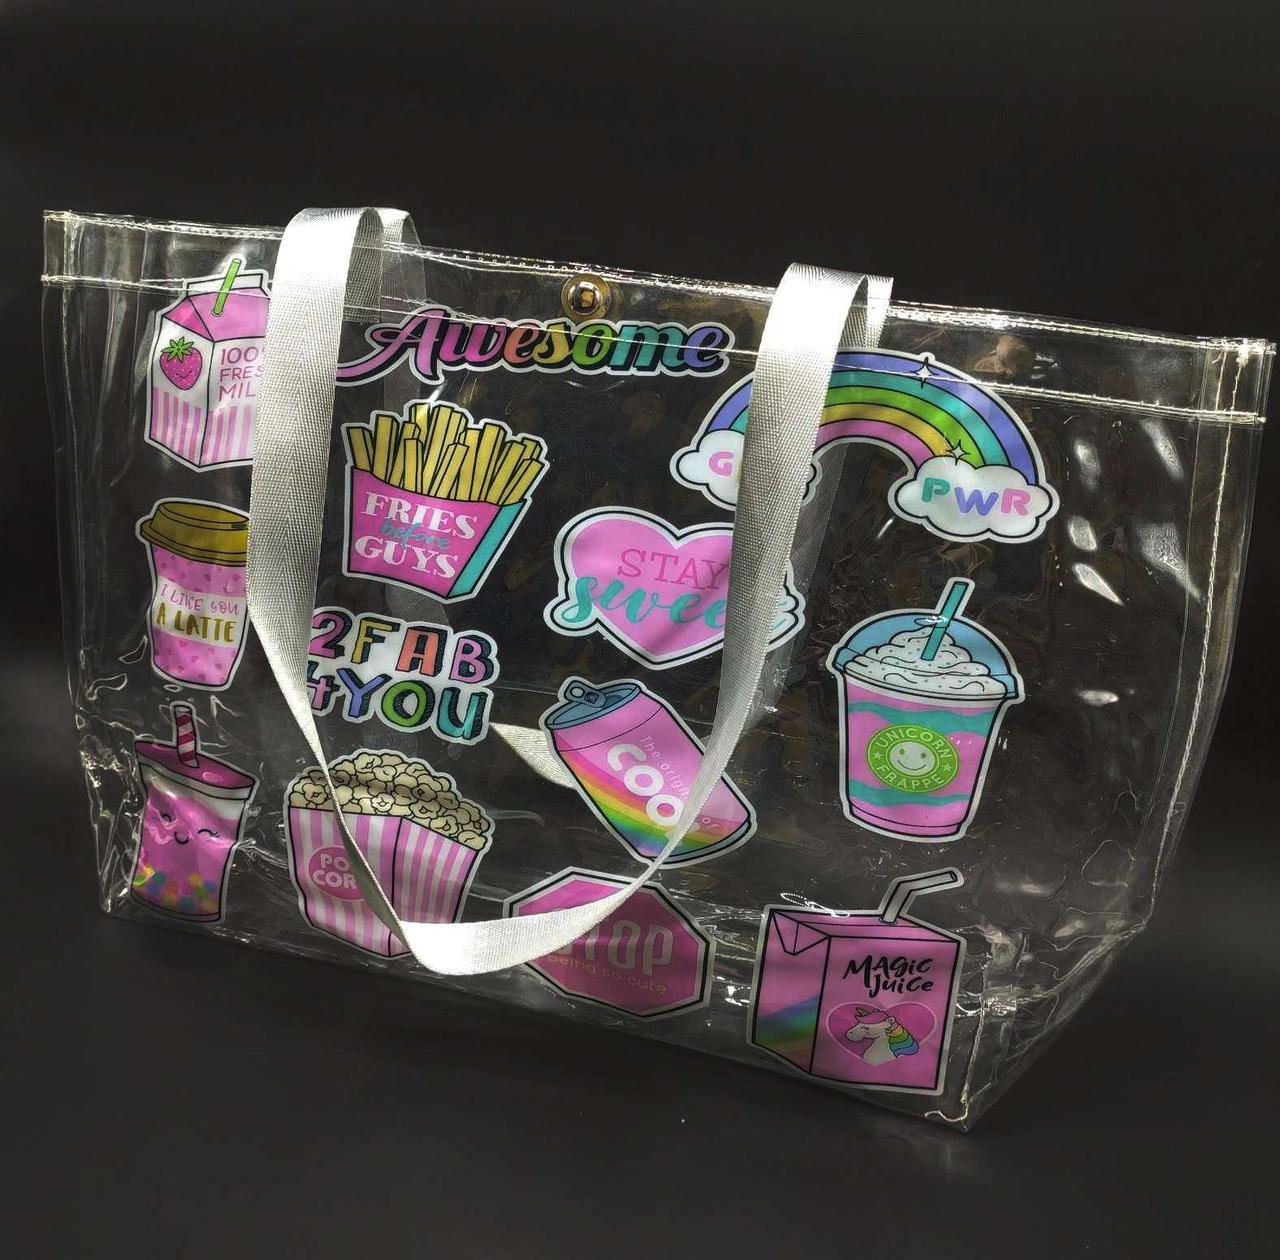 Прозора стильна сумка - 2FAB4YOU